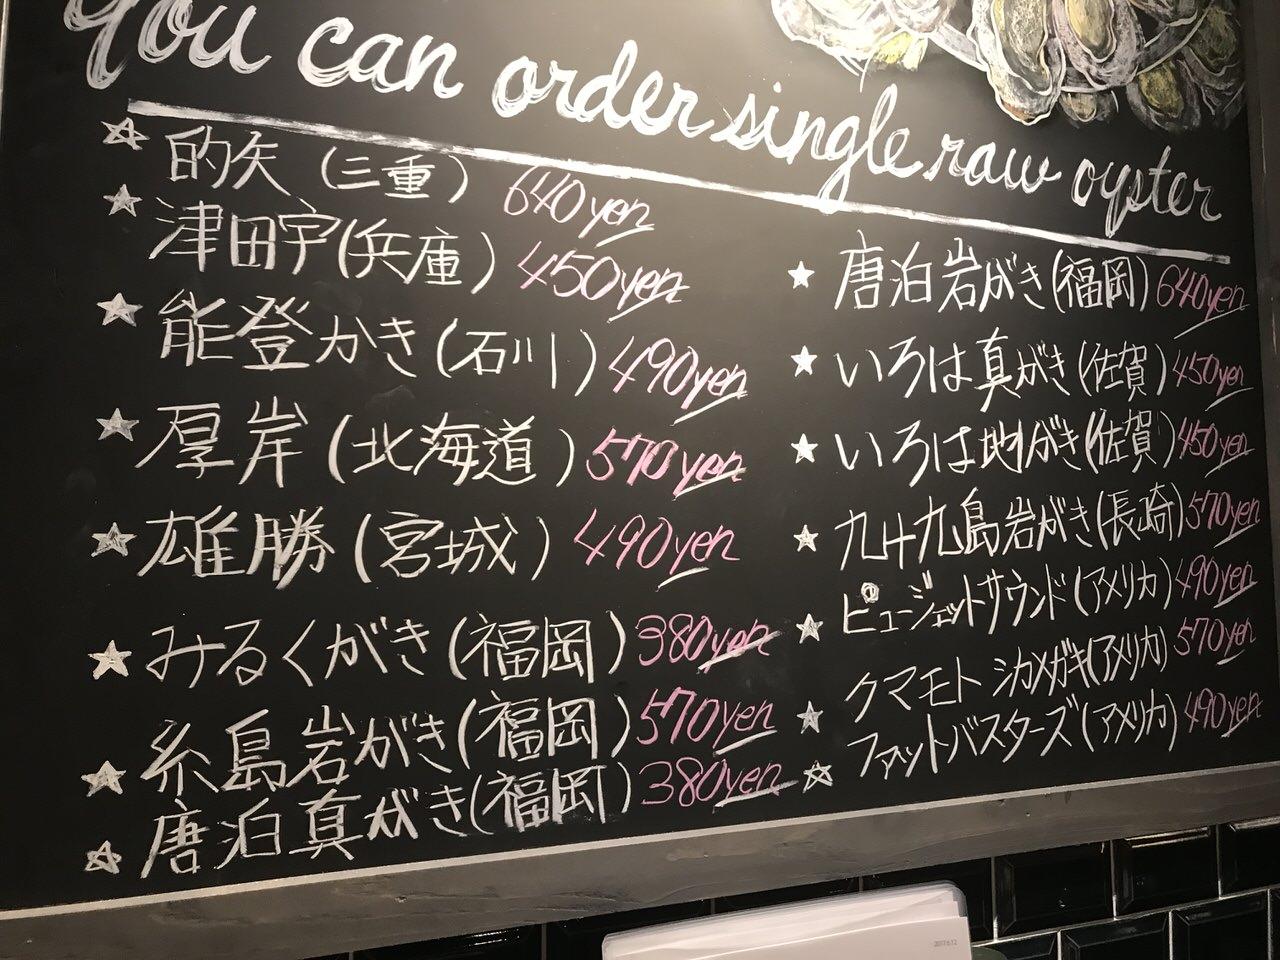 Shinjuku nishiguchi oyster bar 3242